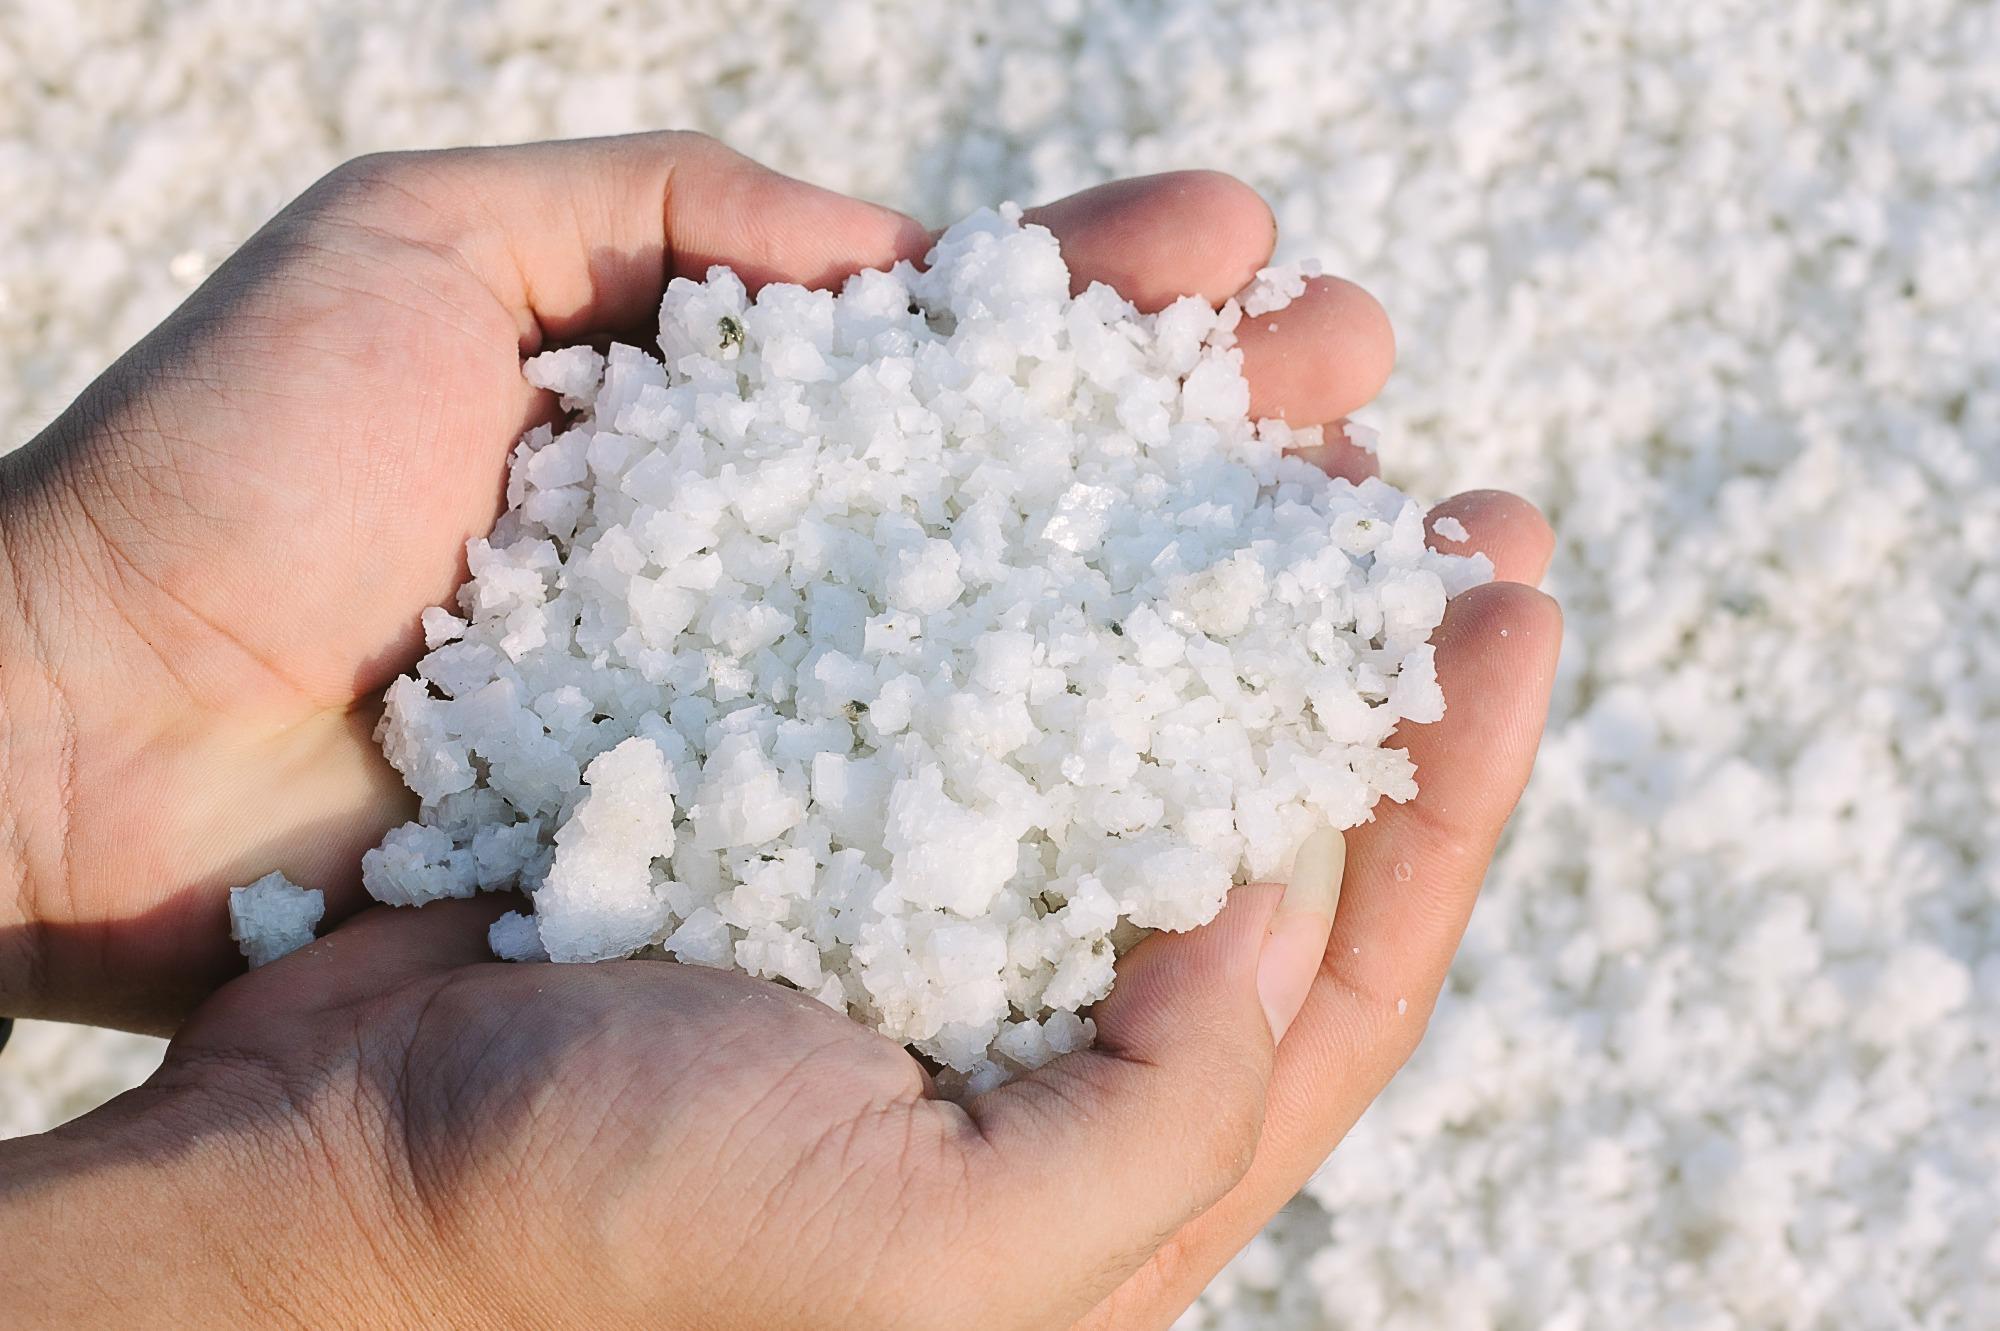 Atlas Salt's Great Atlantic Feasibility Study Accelerates into New Phase